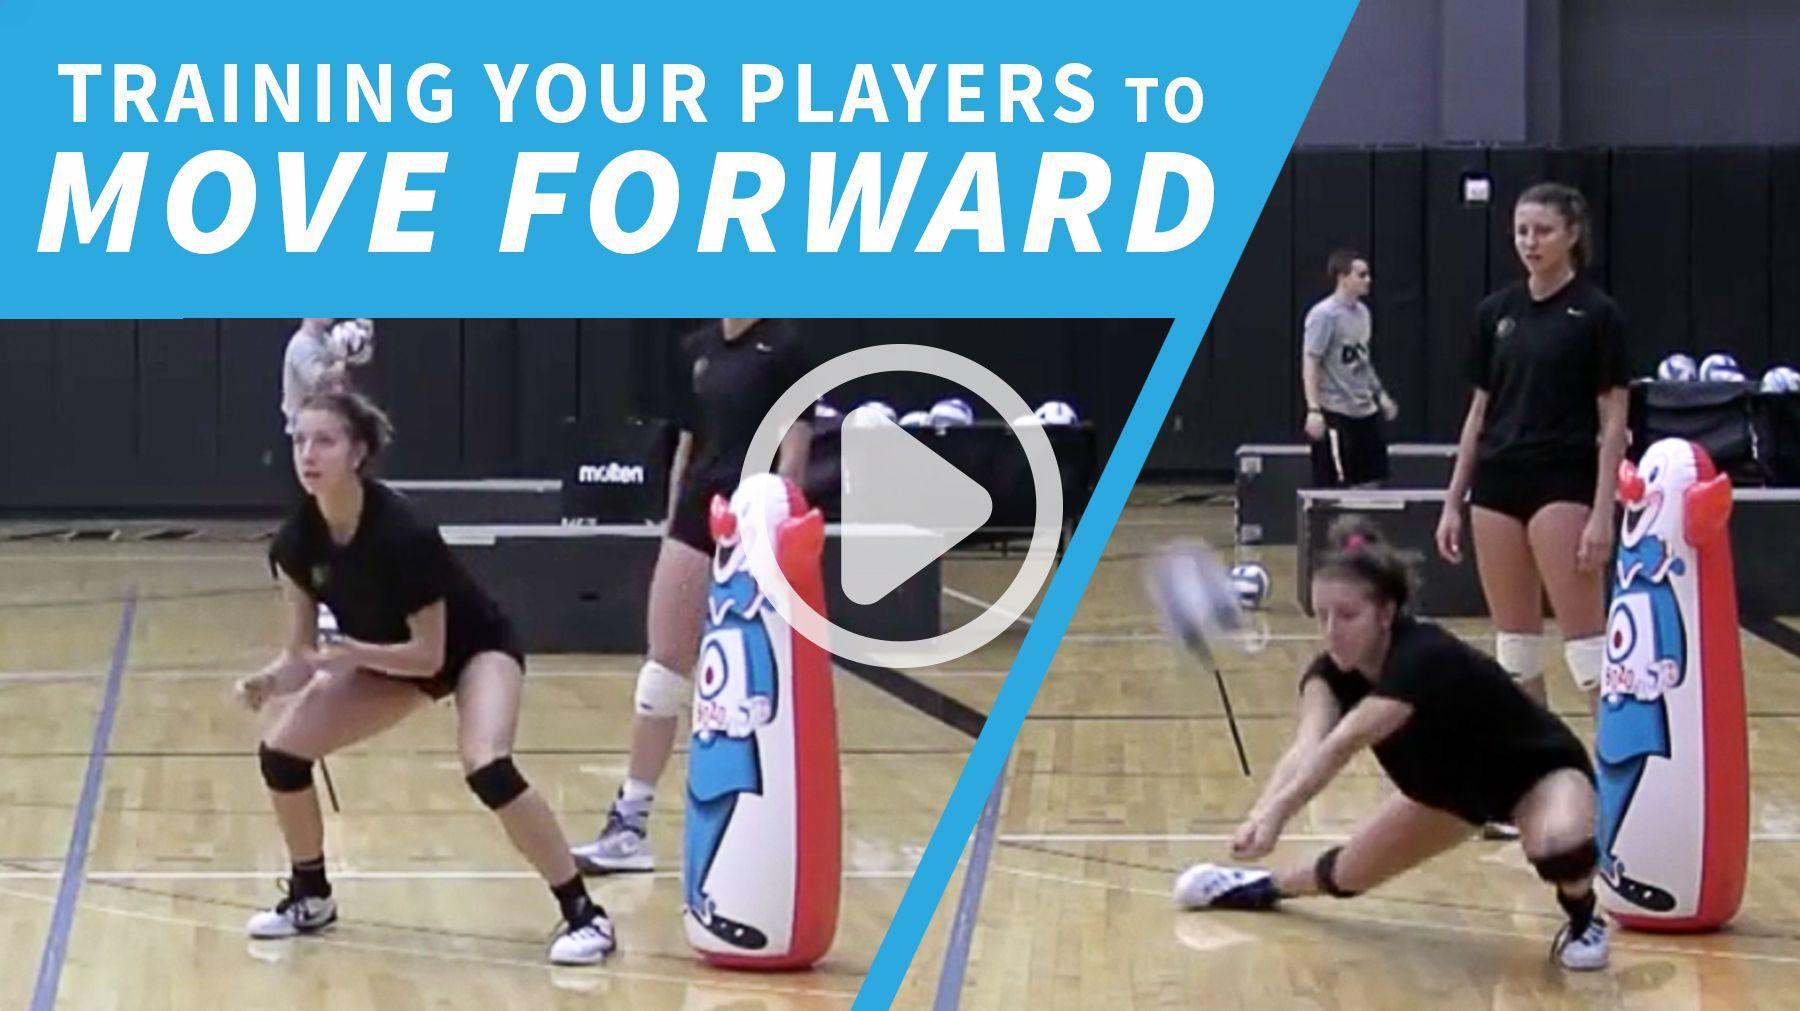 Training Players To Finish Forward Coaching Volleyball Volleyball Drills Volleyball Skills